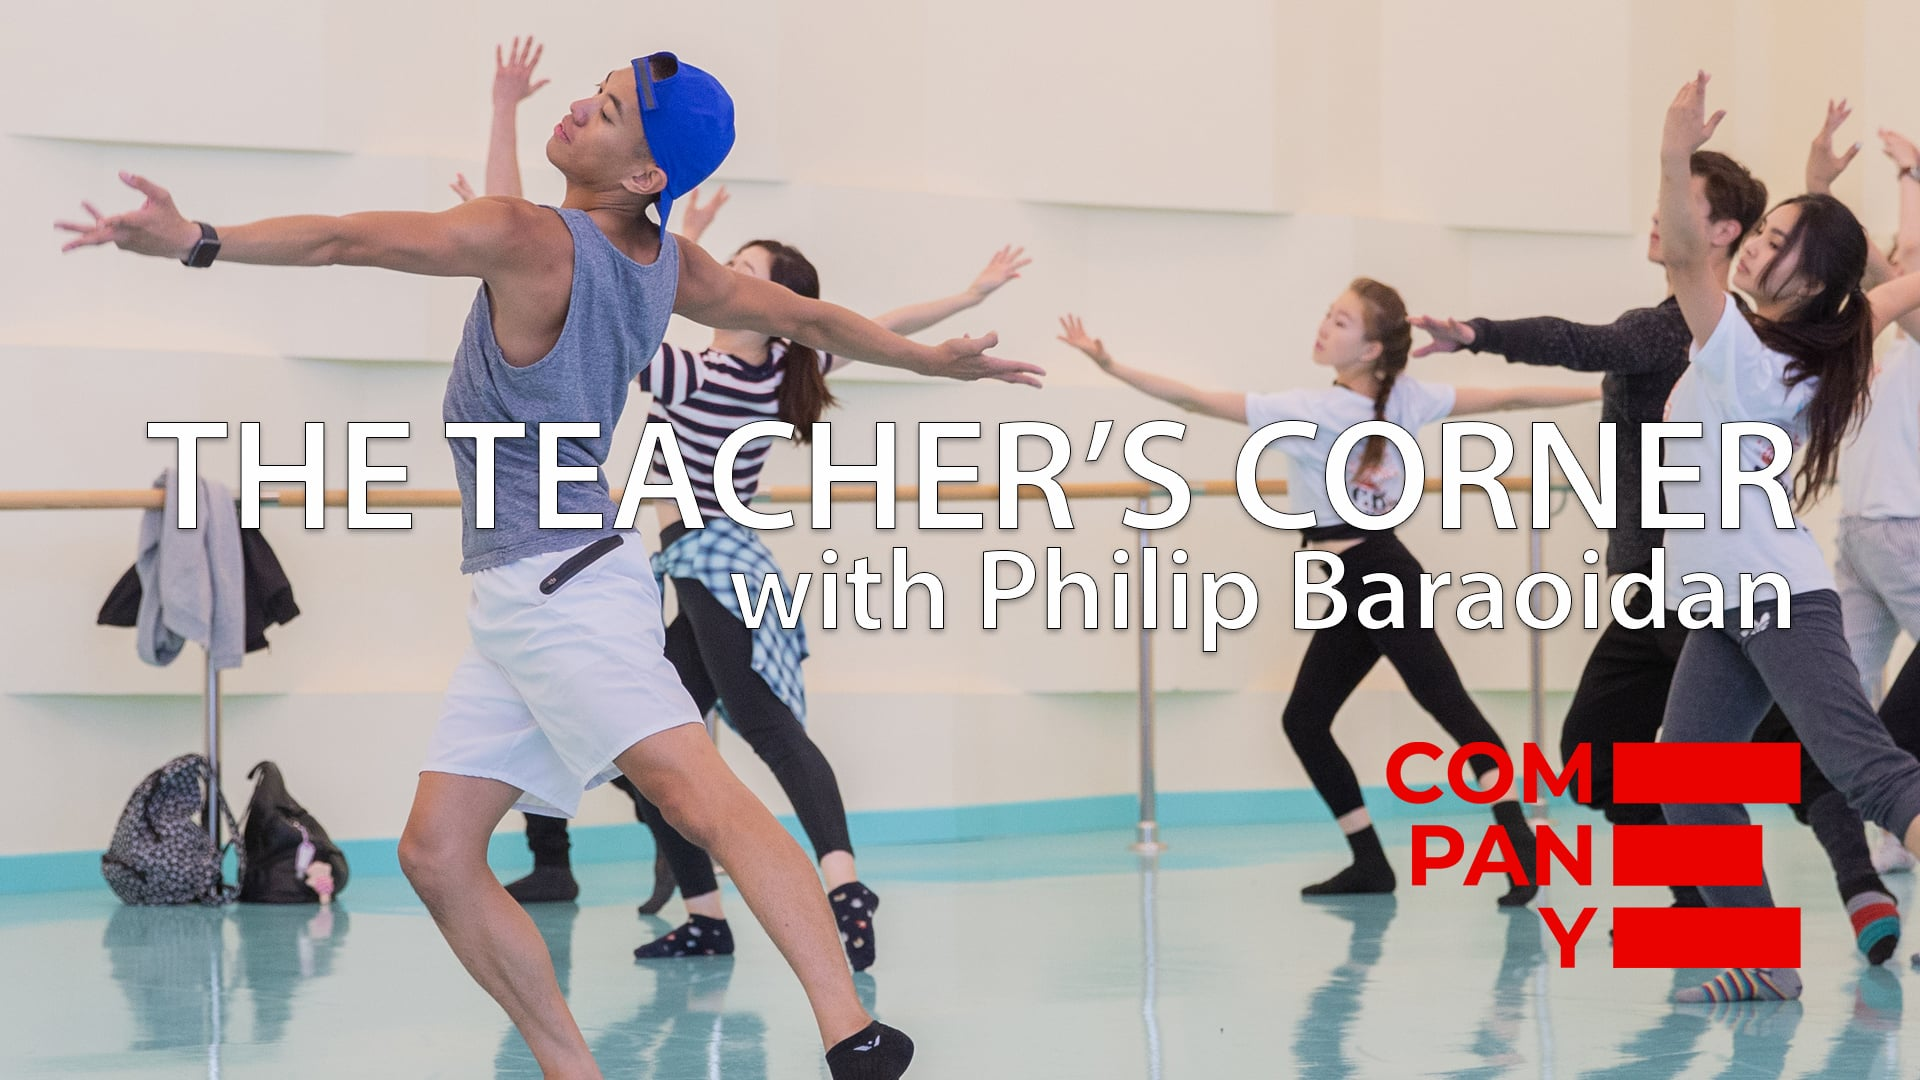 The Teacher's Corner with Philip Baraoidan